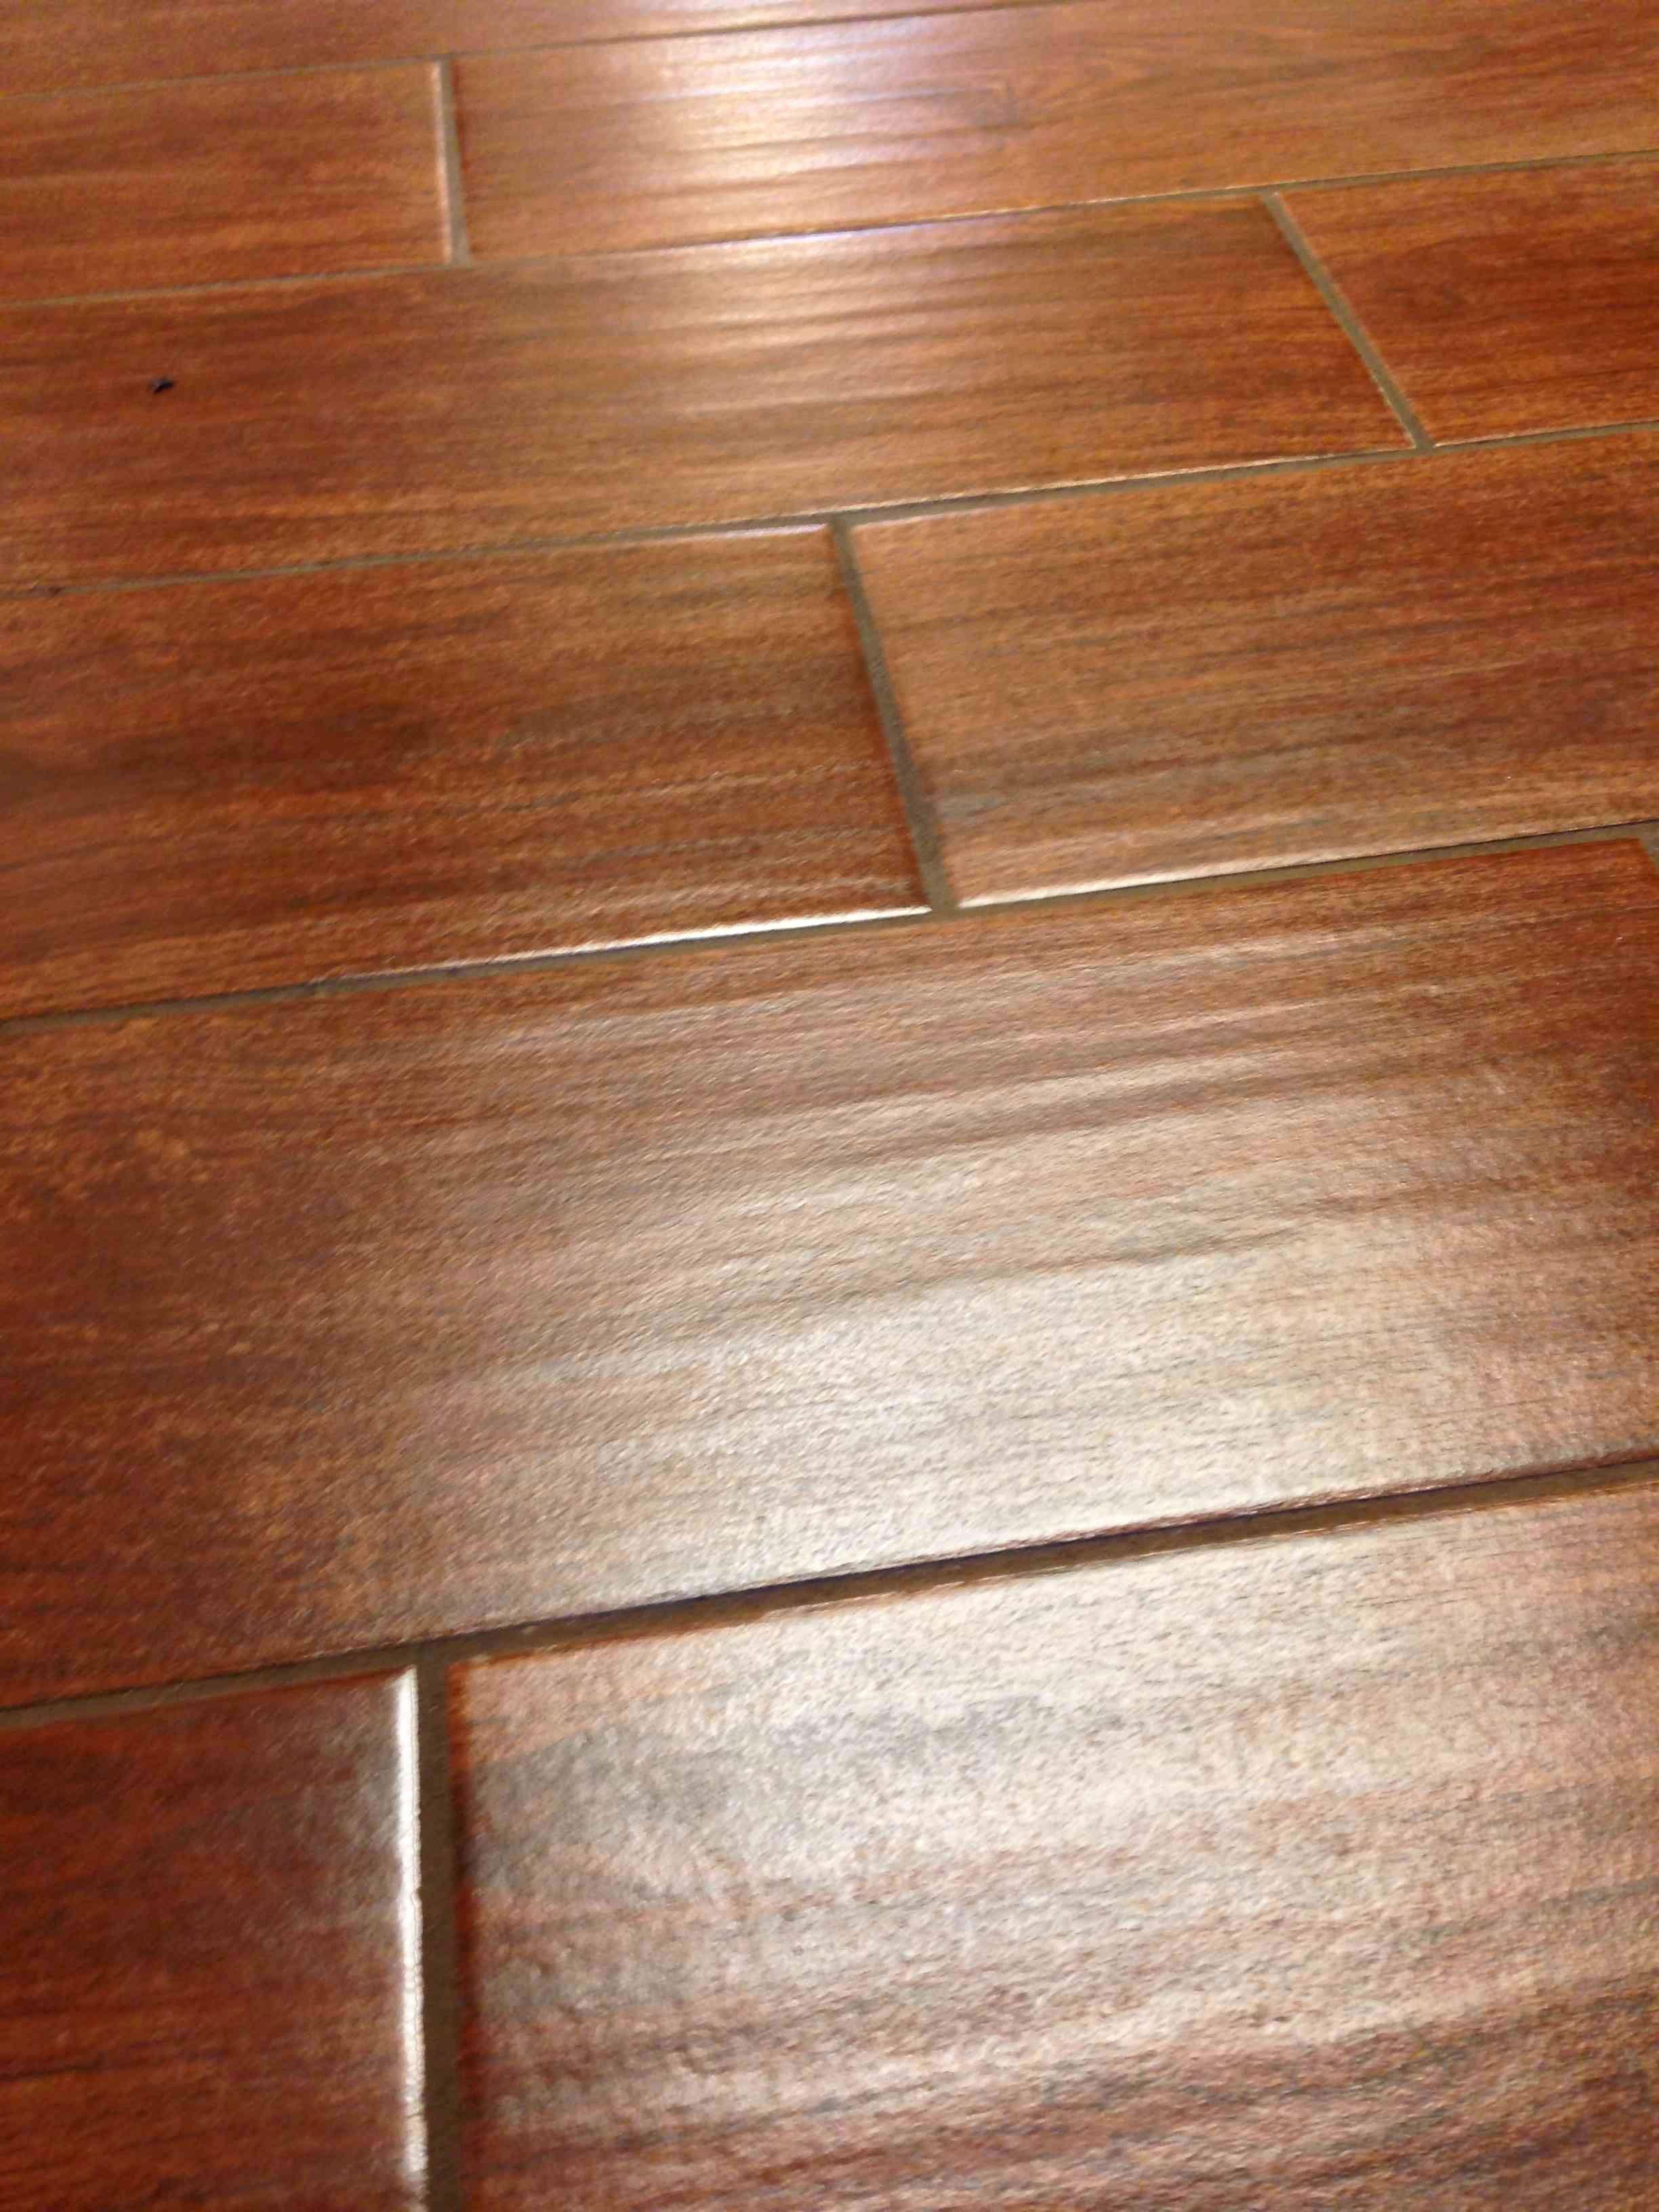 how to lay engineered hardwood flooring over concrete of 40 best type of hardwood flooring images in harwood flooring best tile that looks like hardwood floors elegant i pinimg 736x 0d 7b